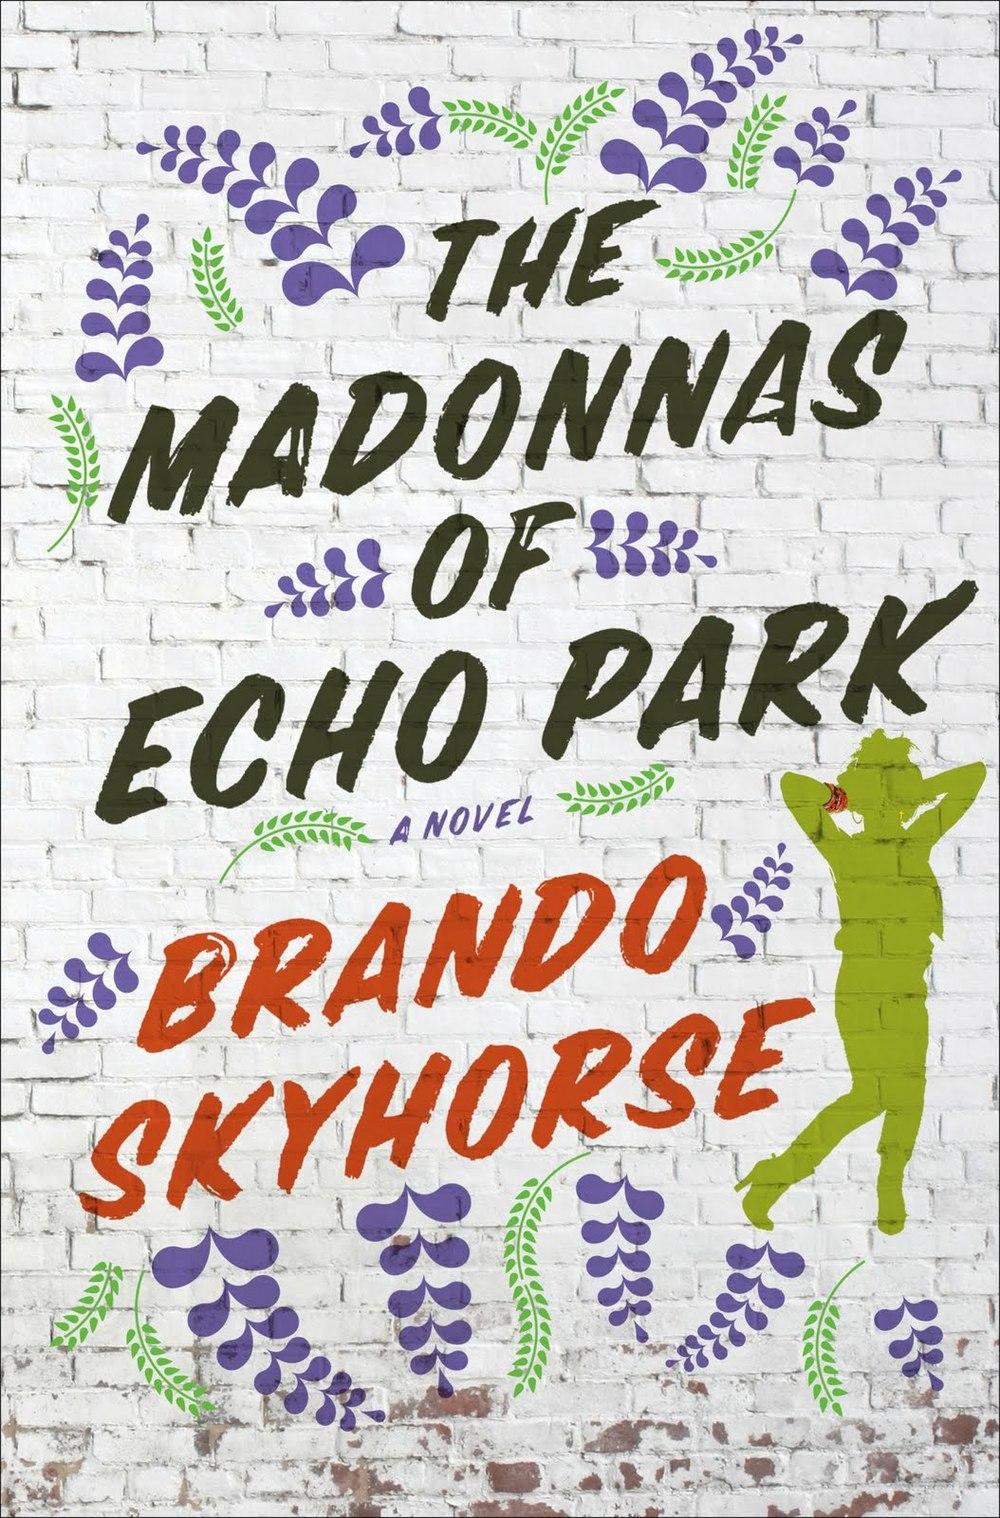 2011 - Brando Skyhorse for  The Madonnas of Echo Park